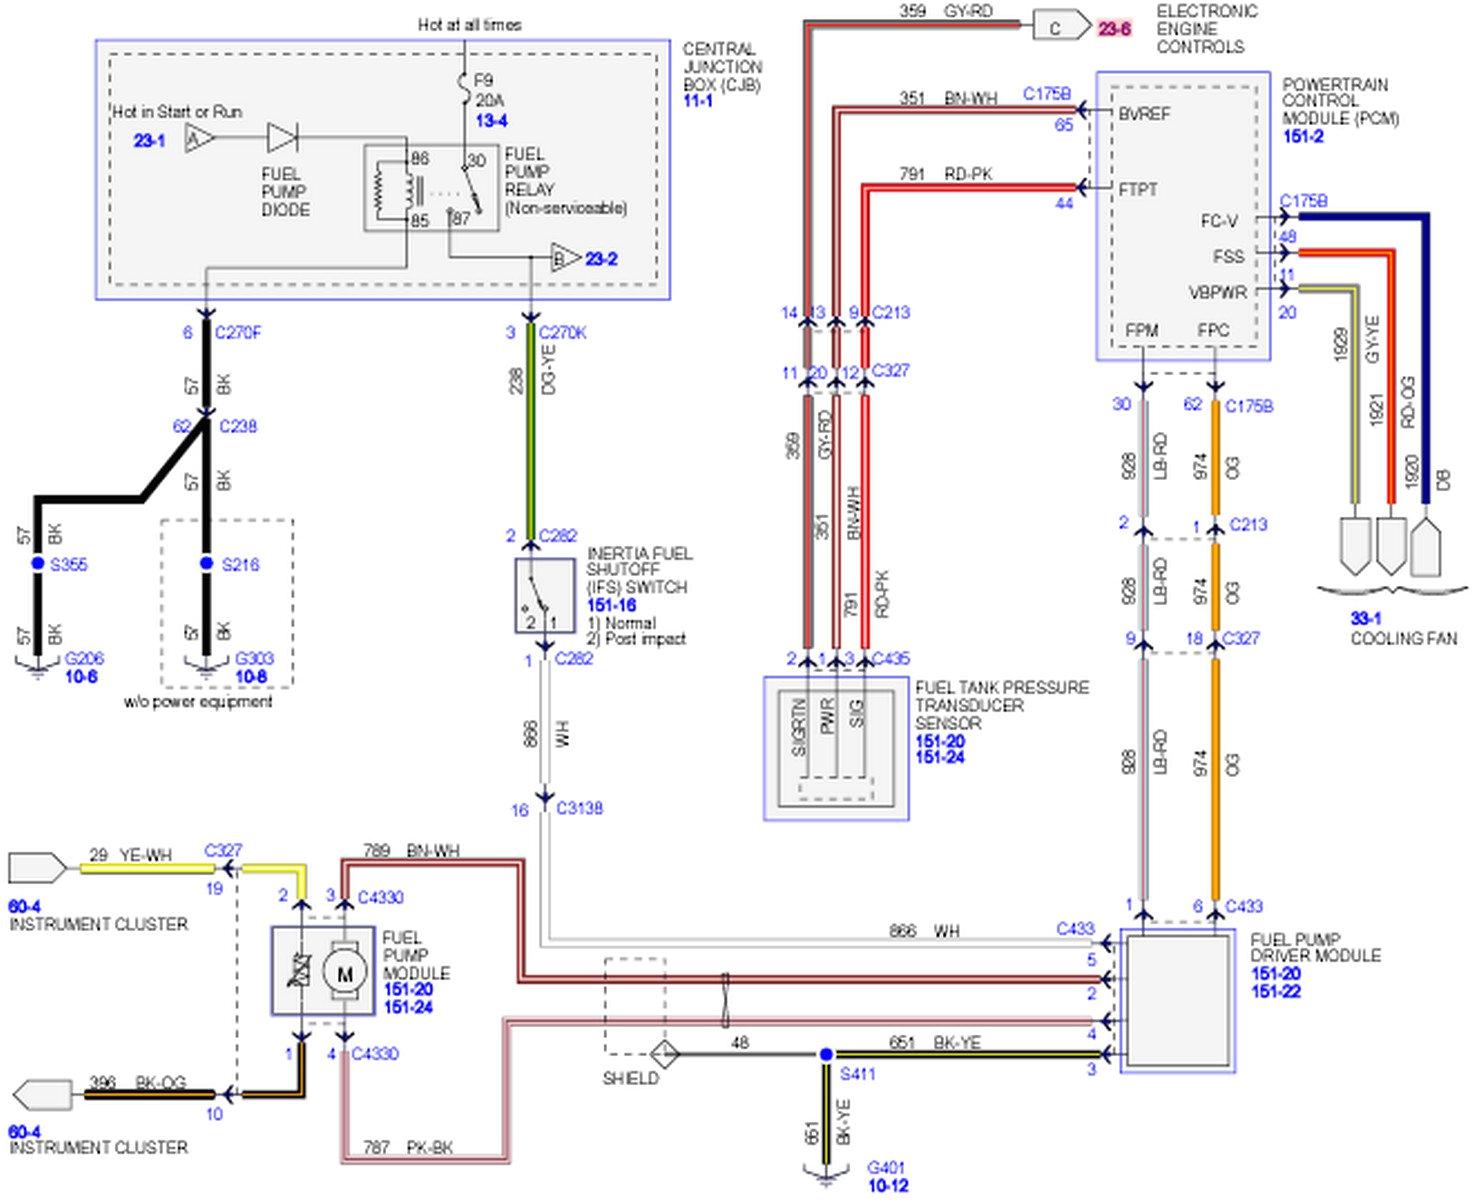 2007 f350 wiring diagram data schematic diagram 2007 ford focus wiring diagram pdf 2007 f350 wiring diagram